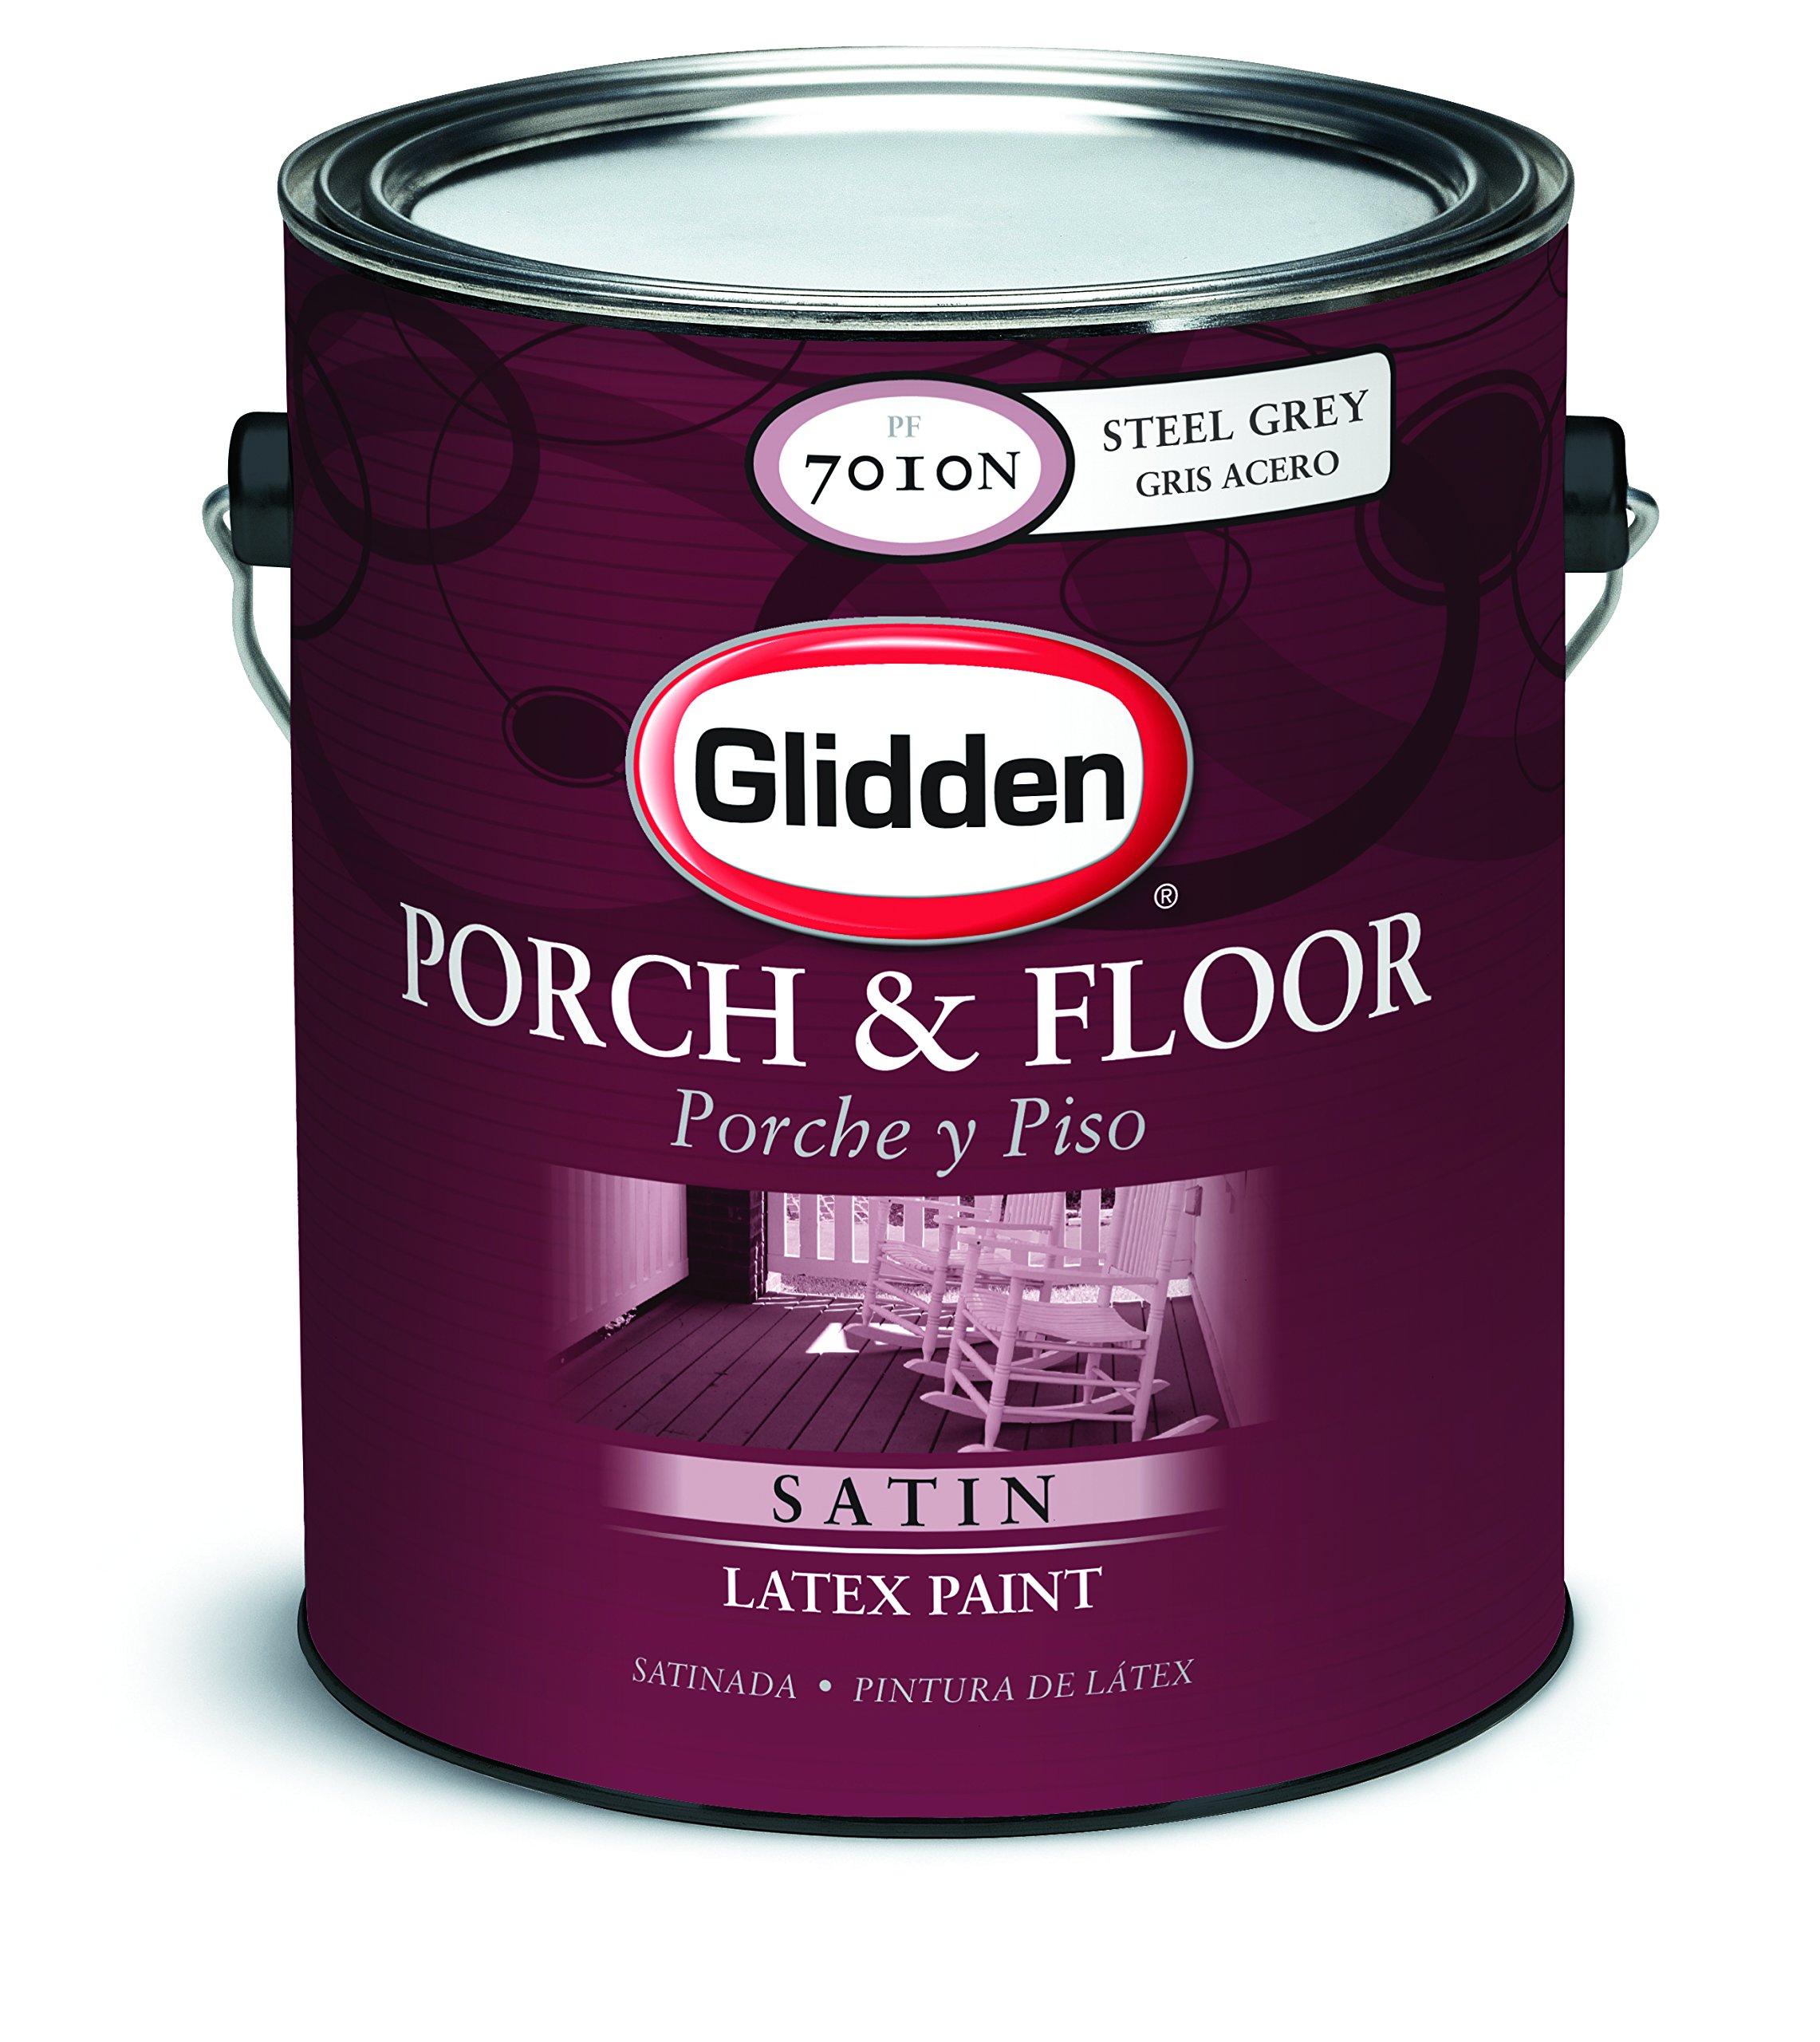 Glidden Latex Paint, Steel Gray, Satin, 1 gal, Interior Or Exterior, Porch & Floor Paint